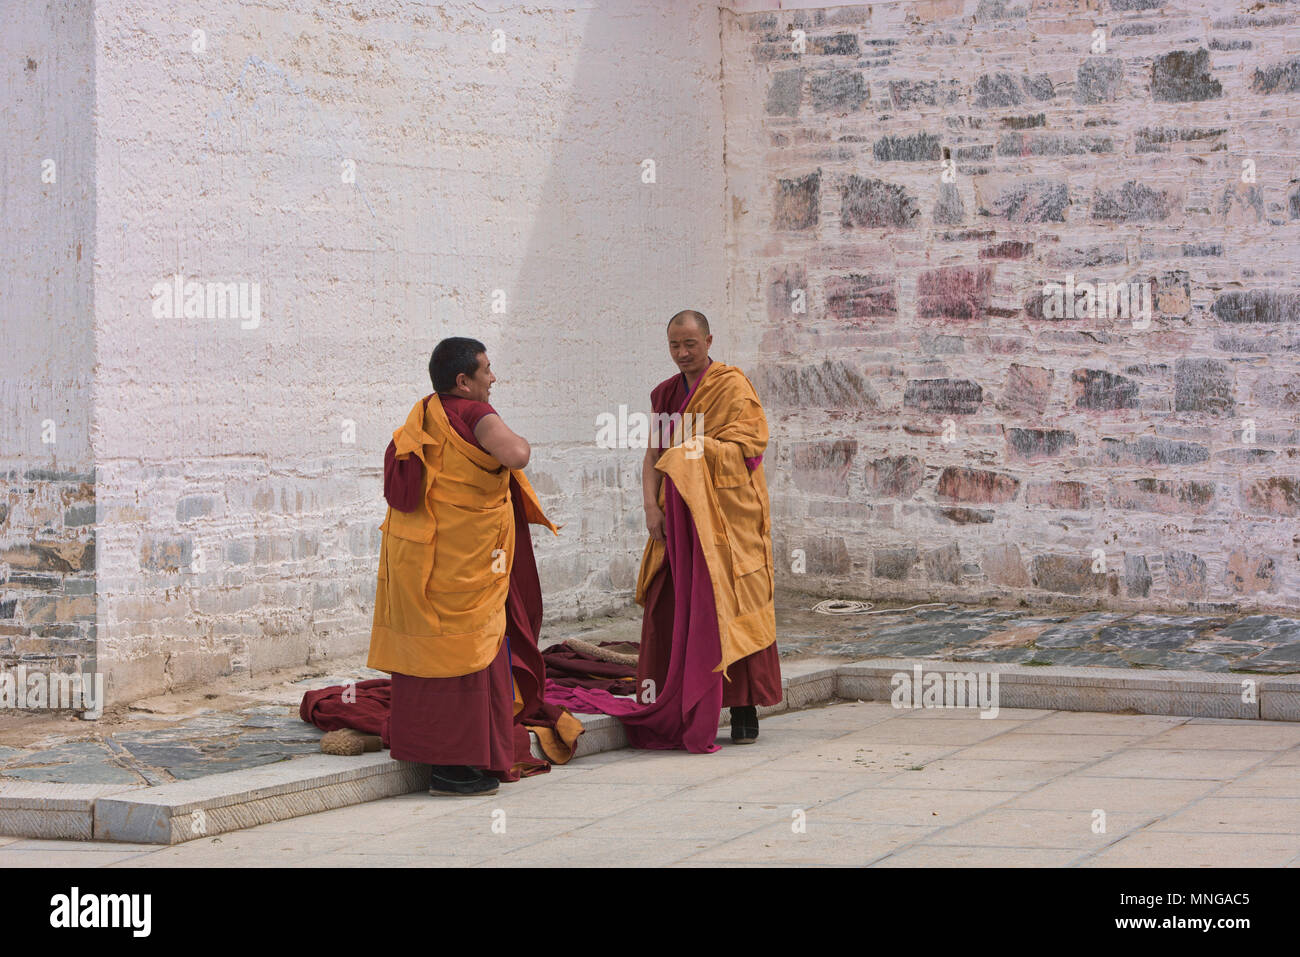 Gelukpa monks putting on their robes, Labrang Monastery, Xiahe, Gansu, China - Stock Image